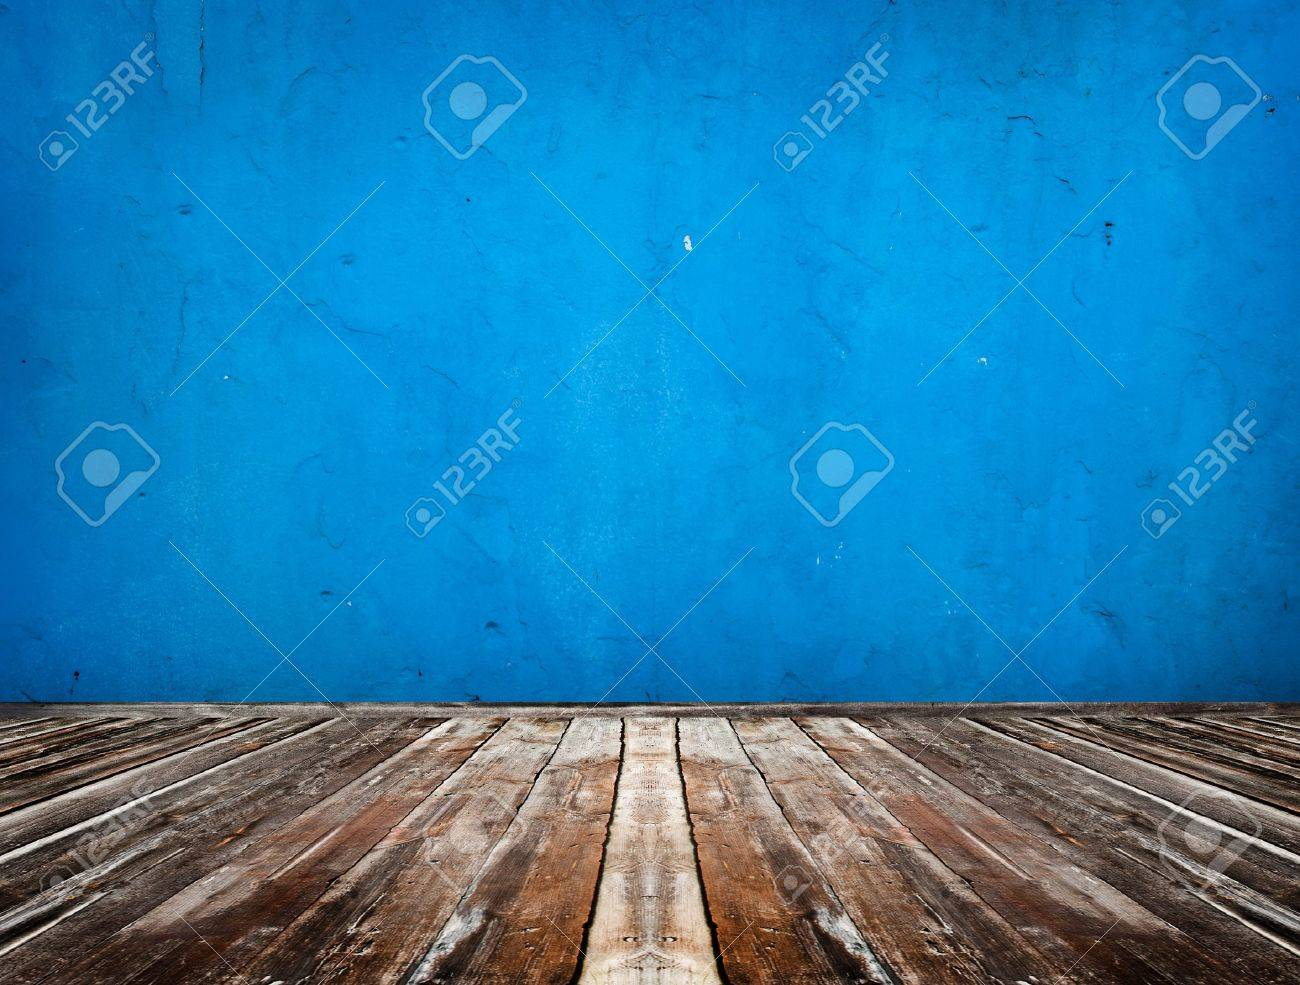 blue empty room with wooden floor Stock Photo - 9544709